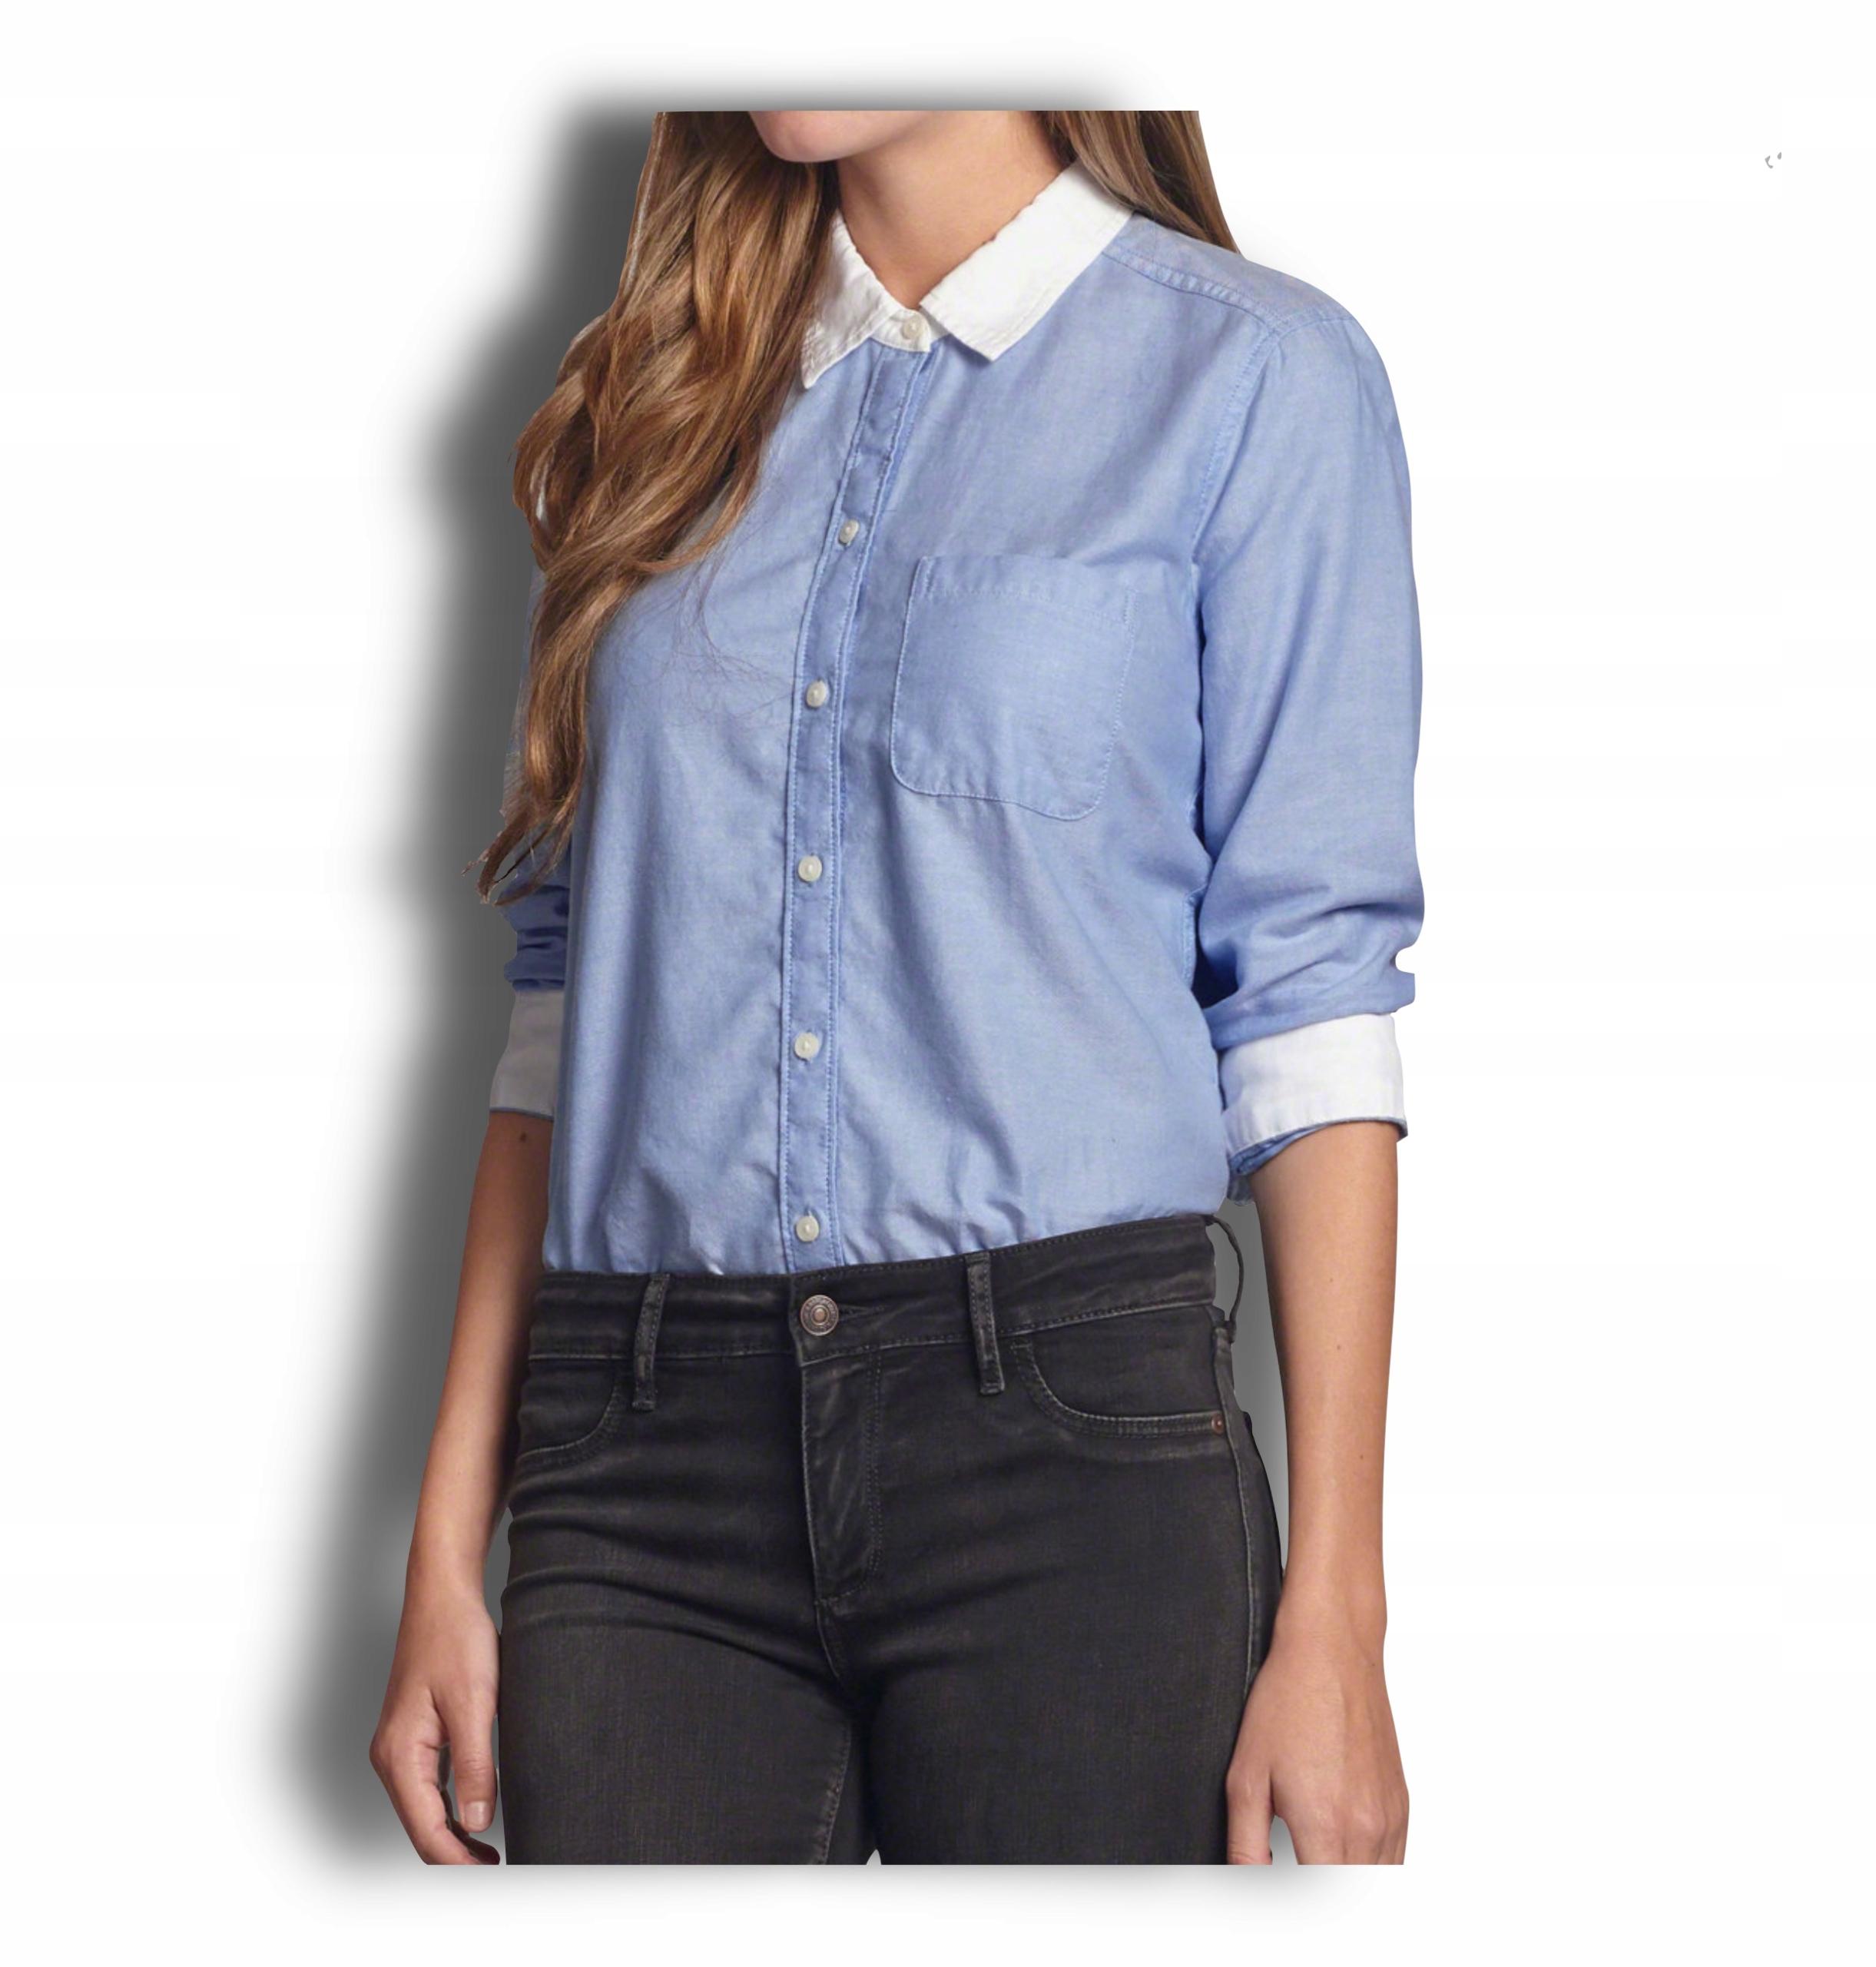 Koszula damska niebieska Abercrombie Hollister L